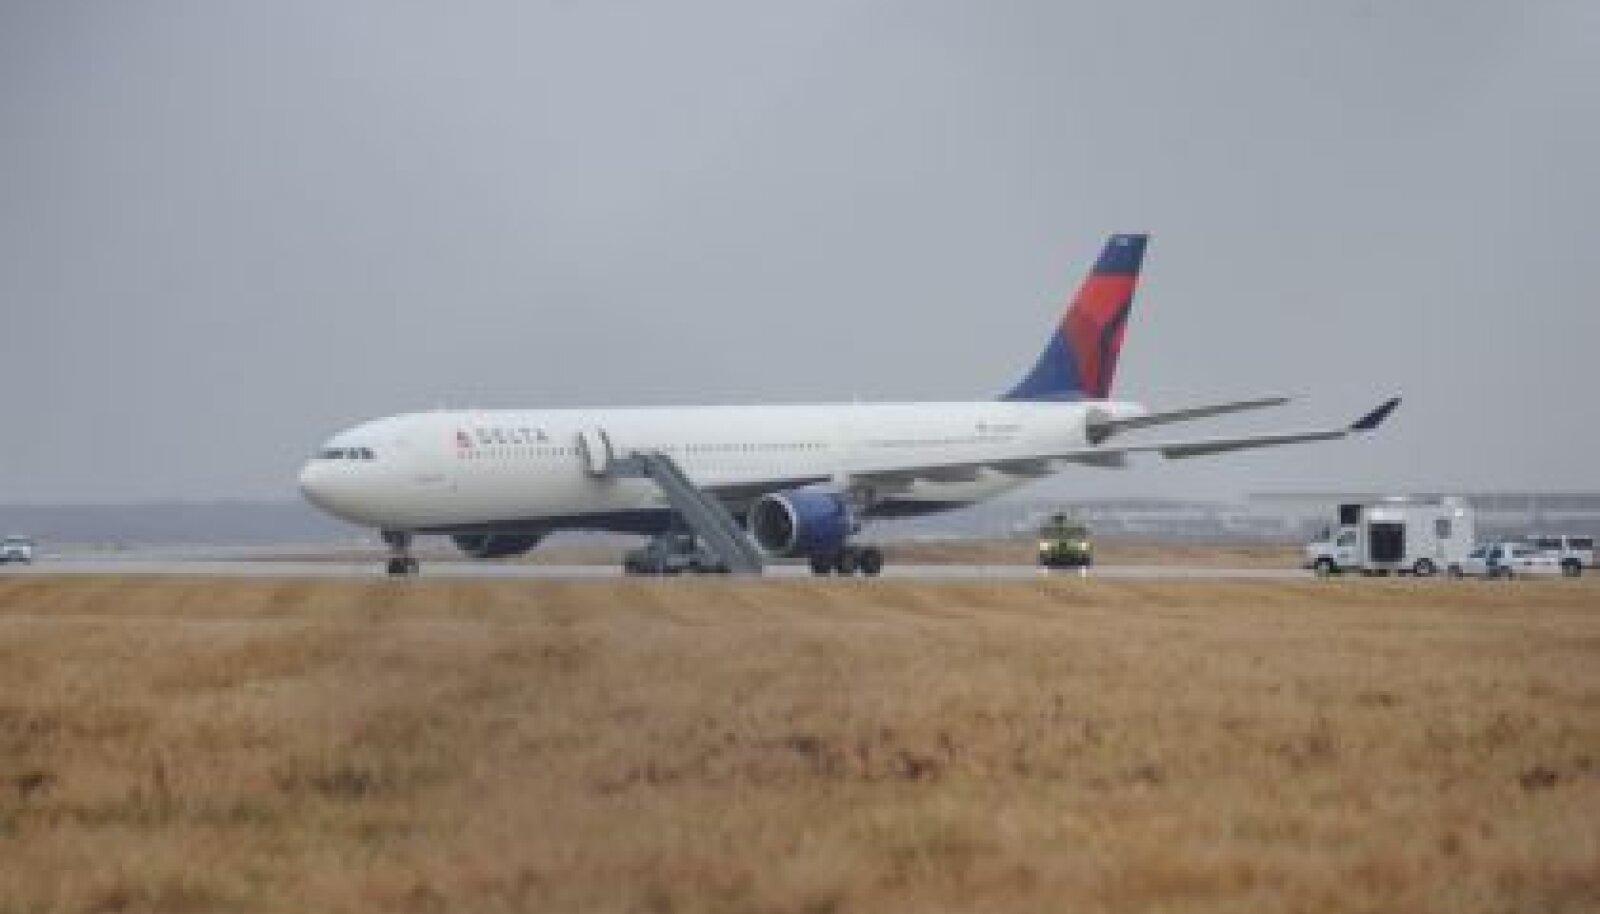 Delta Northwest airlines reisilennuk ap